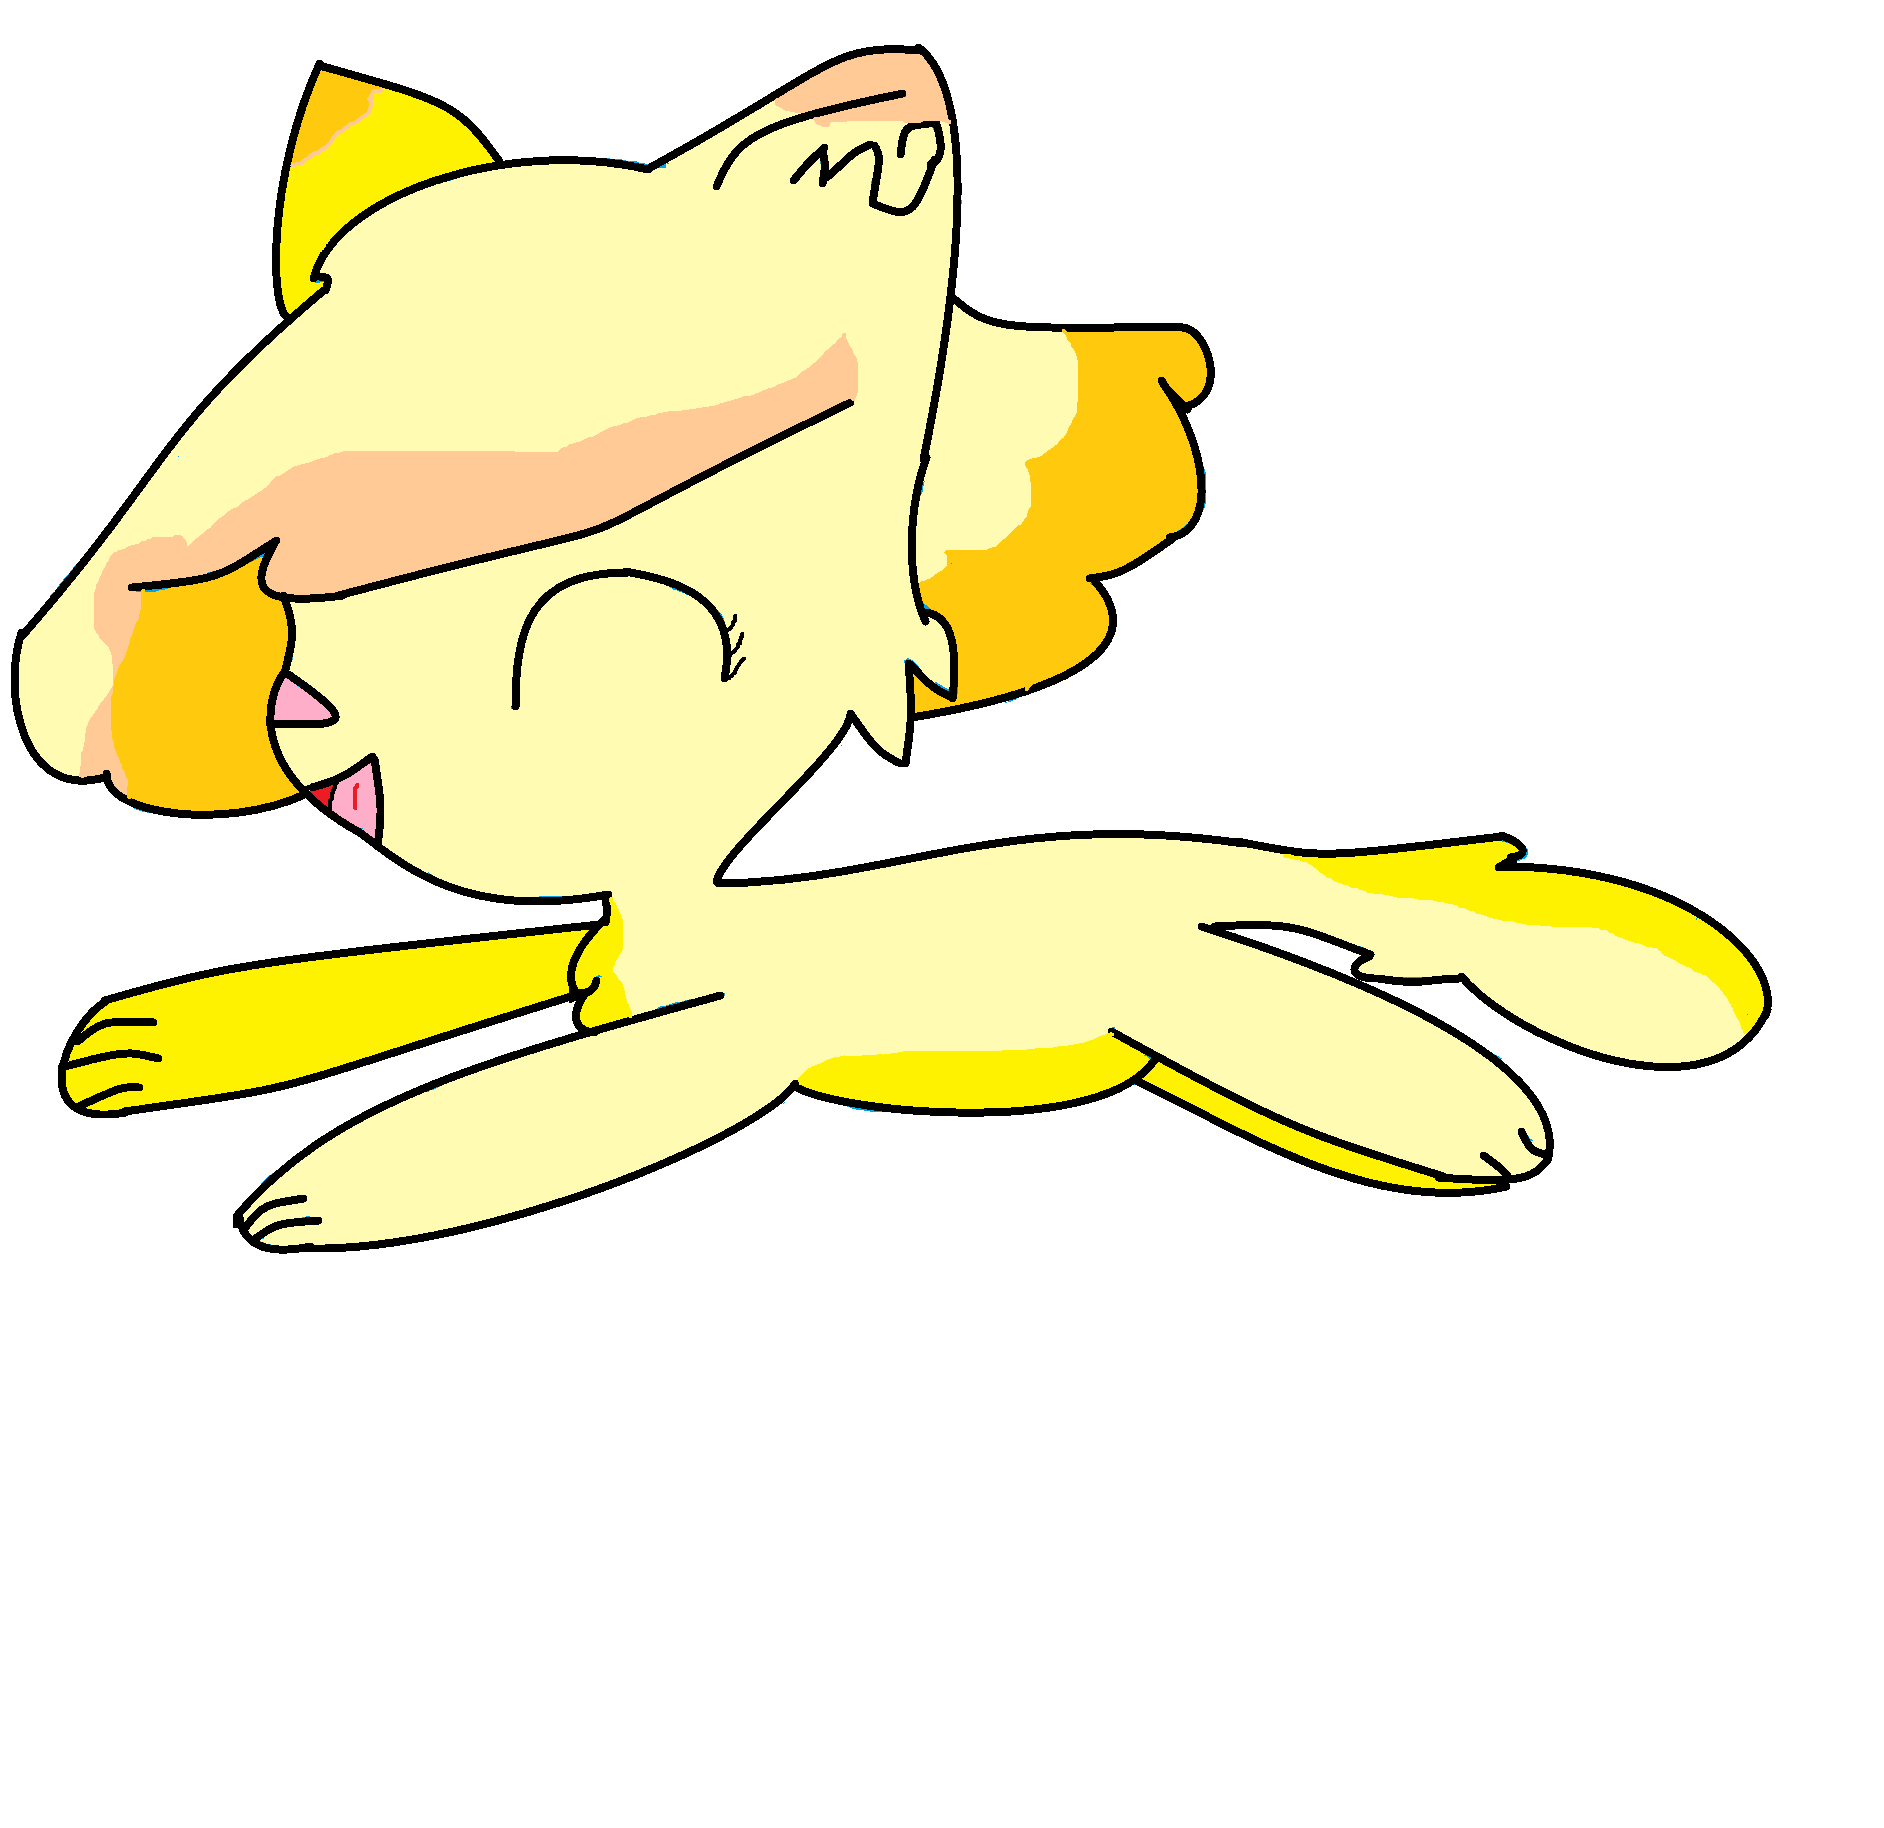 Some cat named Orange Creme.